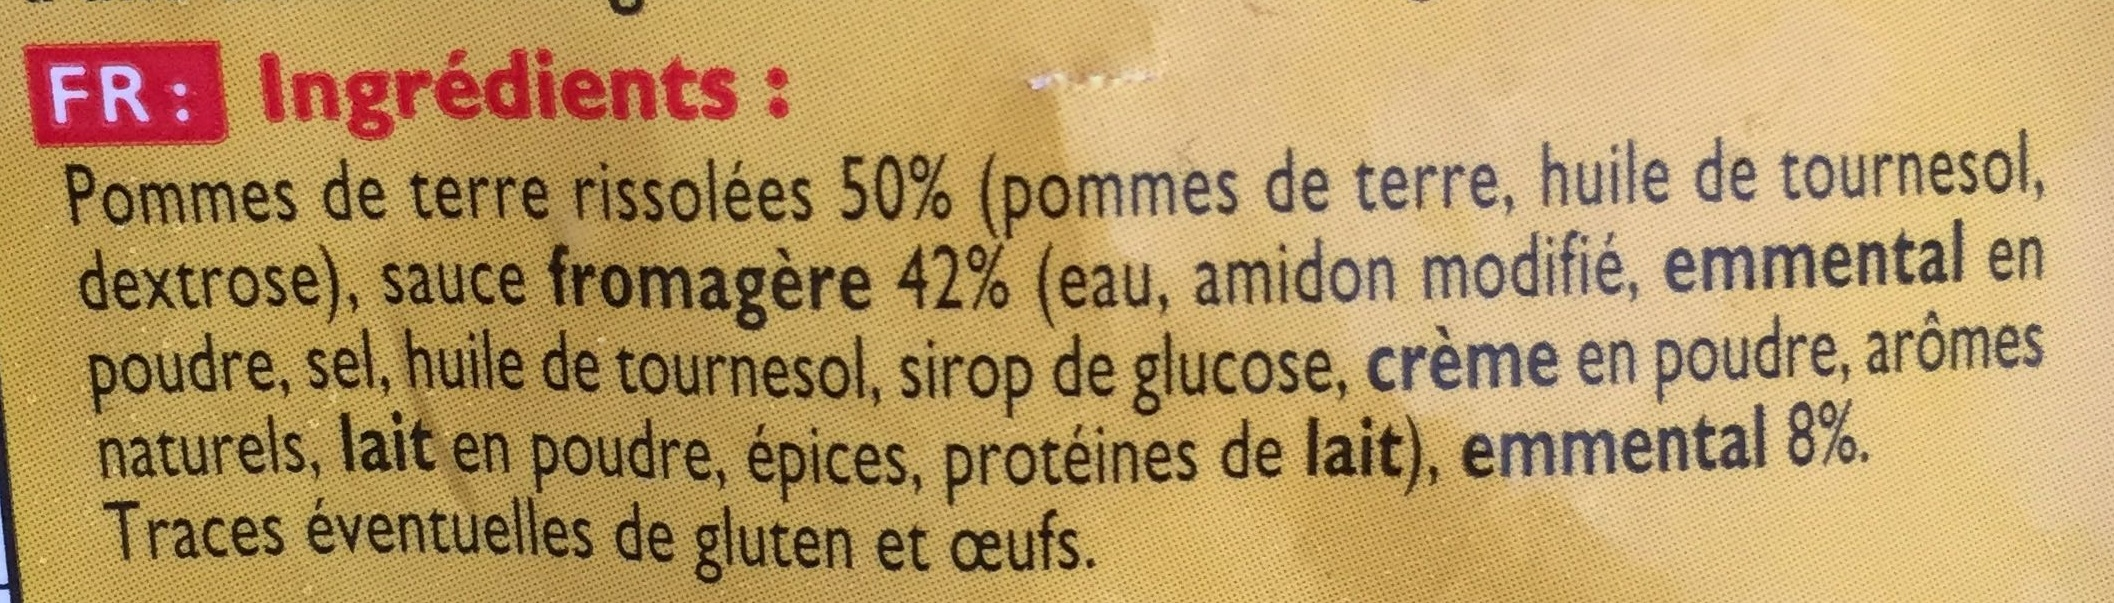 Pommes rissolées au fromage - Ingrediënten